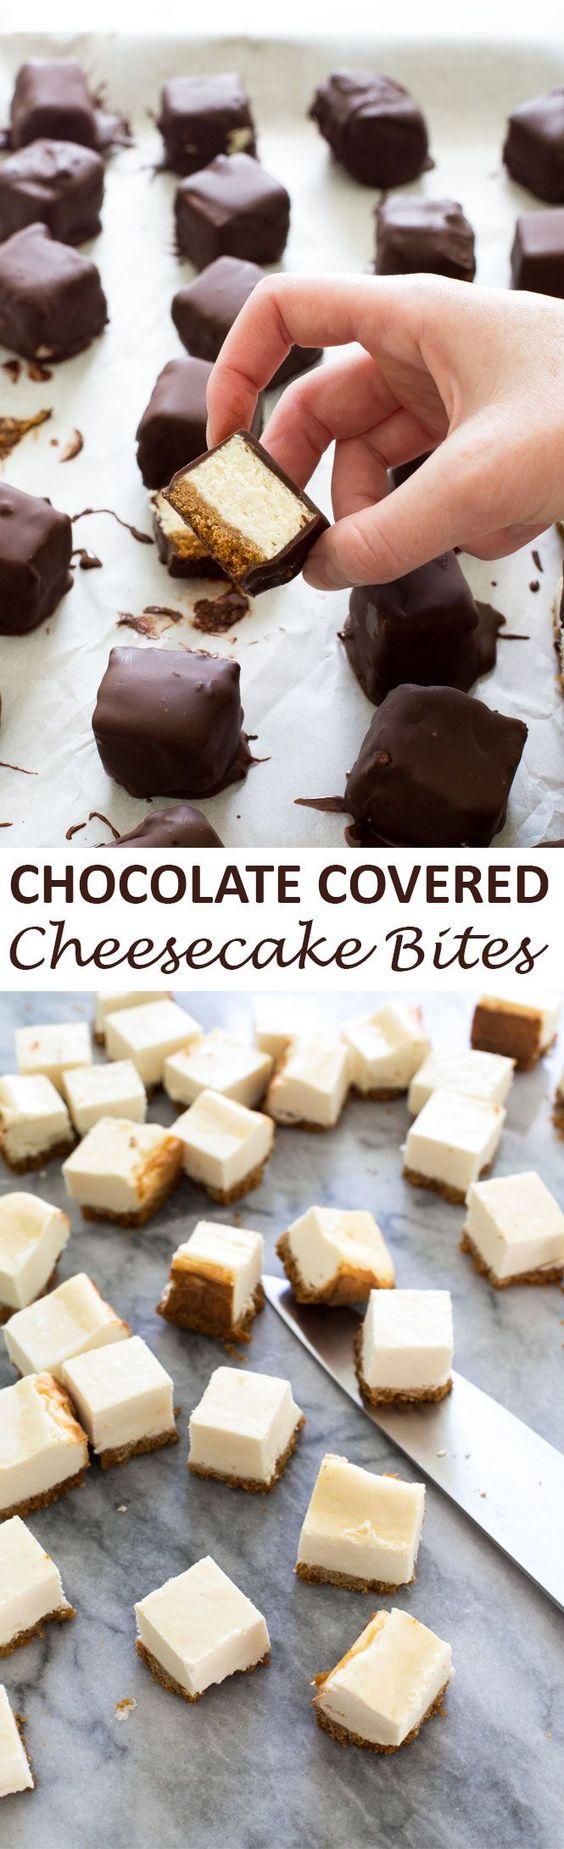 Chocolate Covered Cheesecake Bites. Perfect bite-sized cheesecake covered in a sweet chocolate shell coating.